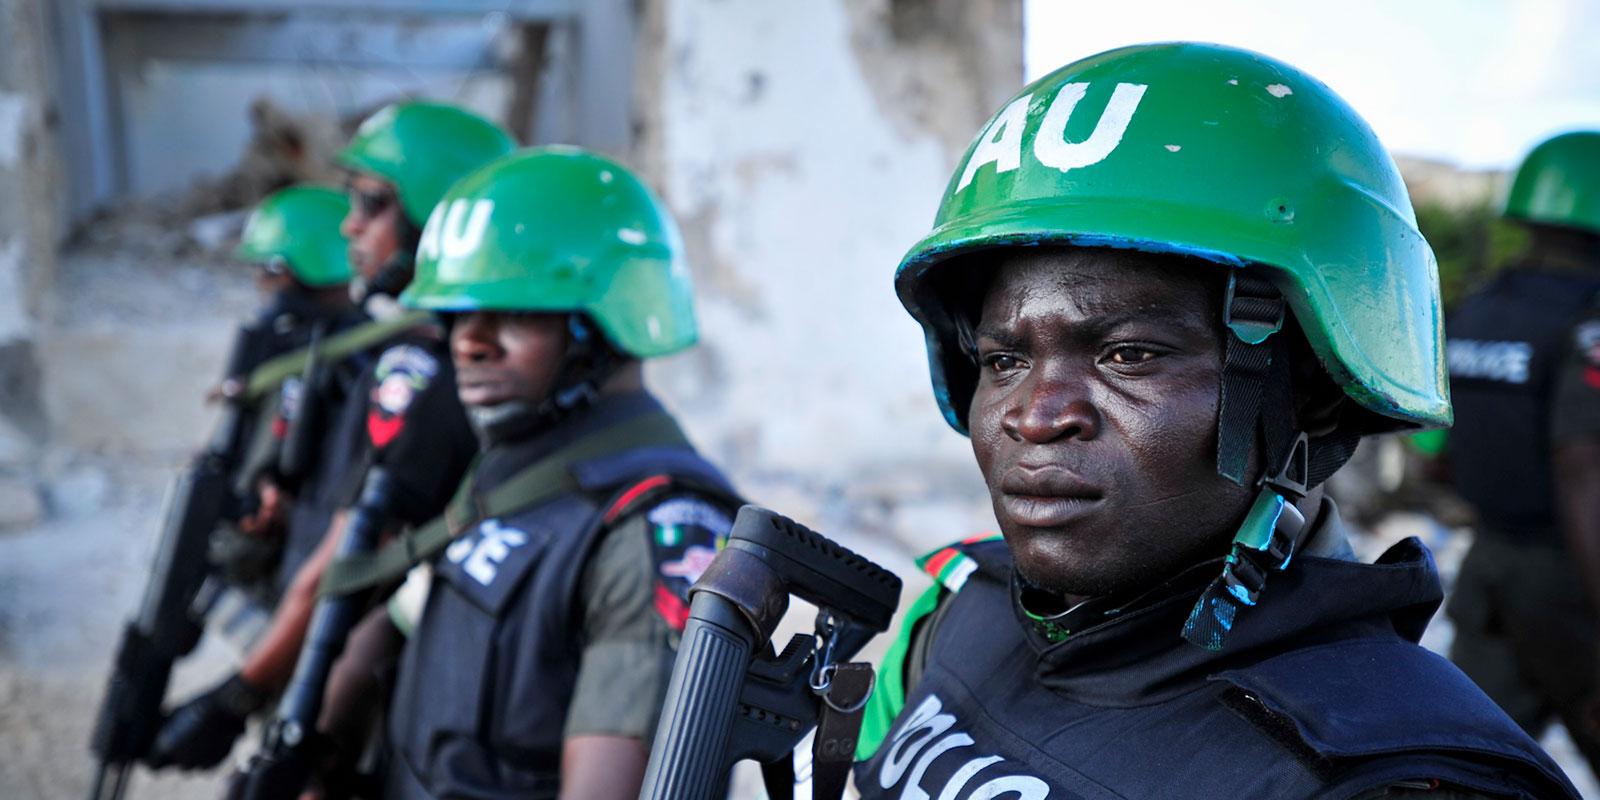 AU-UN IST Photo / Tobin Jones